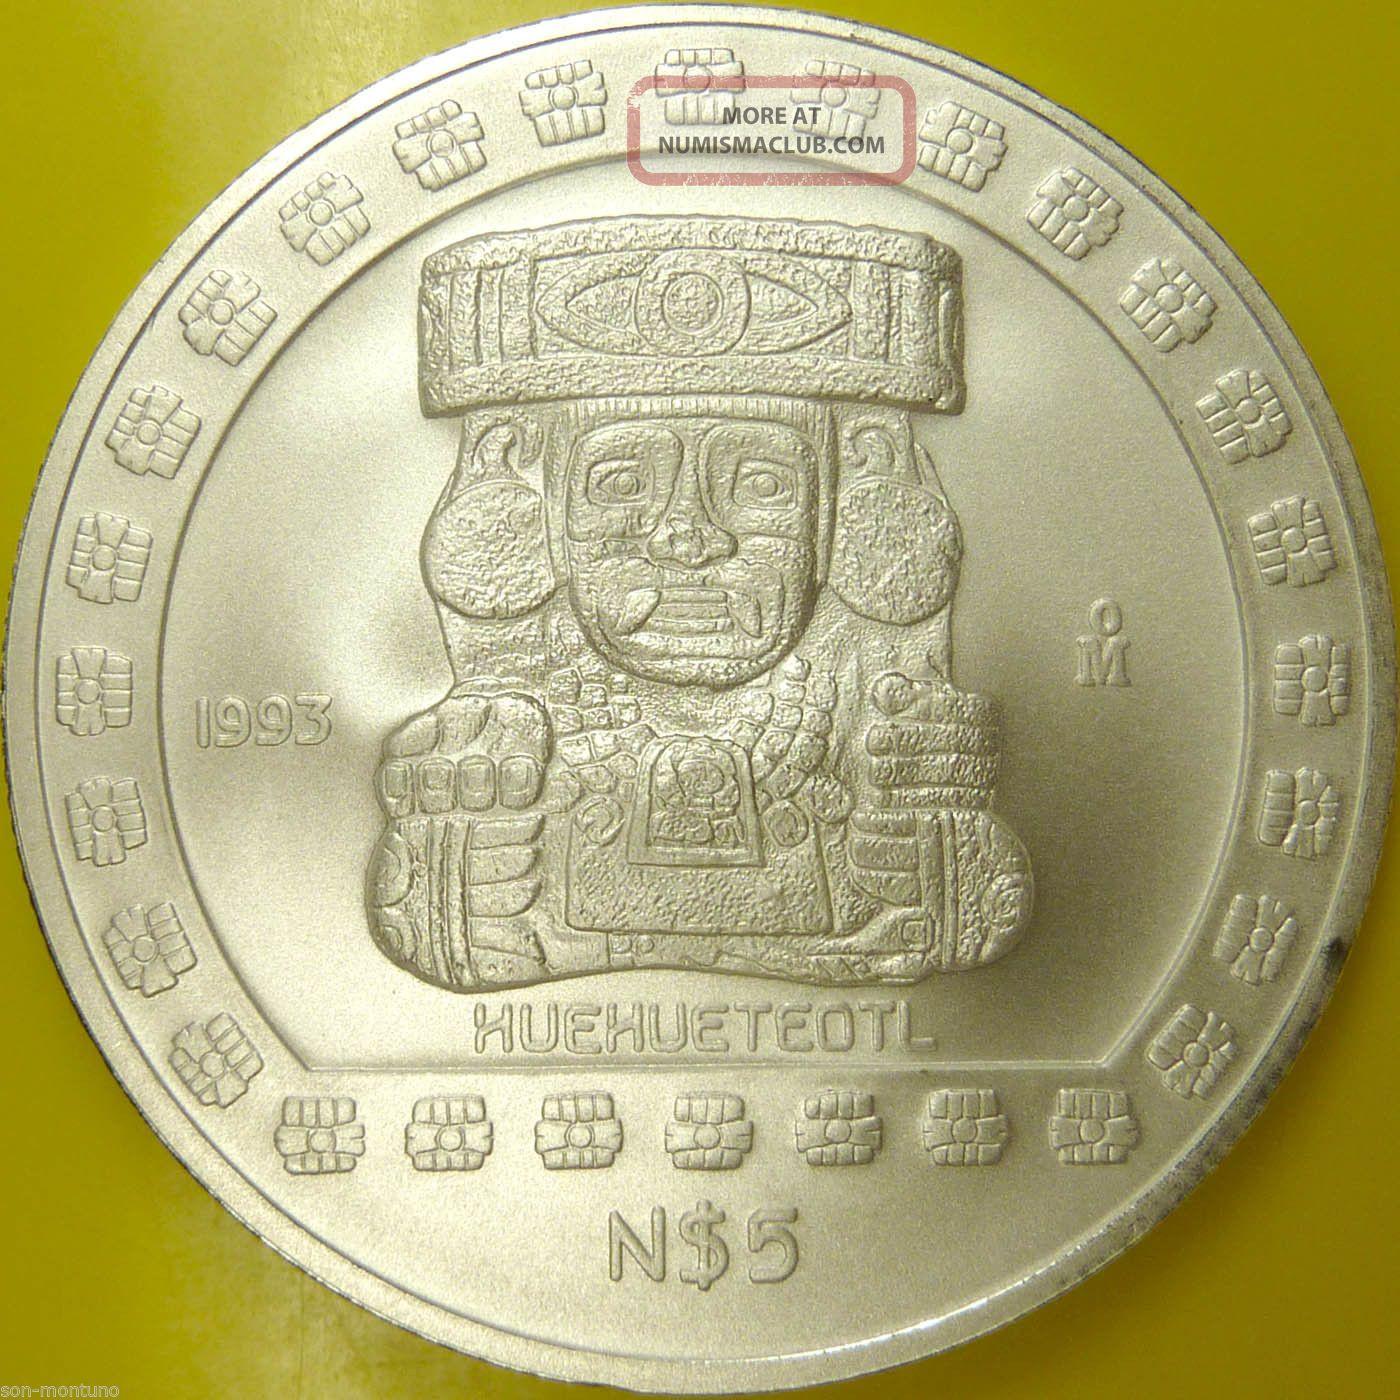 Old Aztec God Silver Coin 1993 1 Oz Mexican 999 Bullion